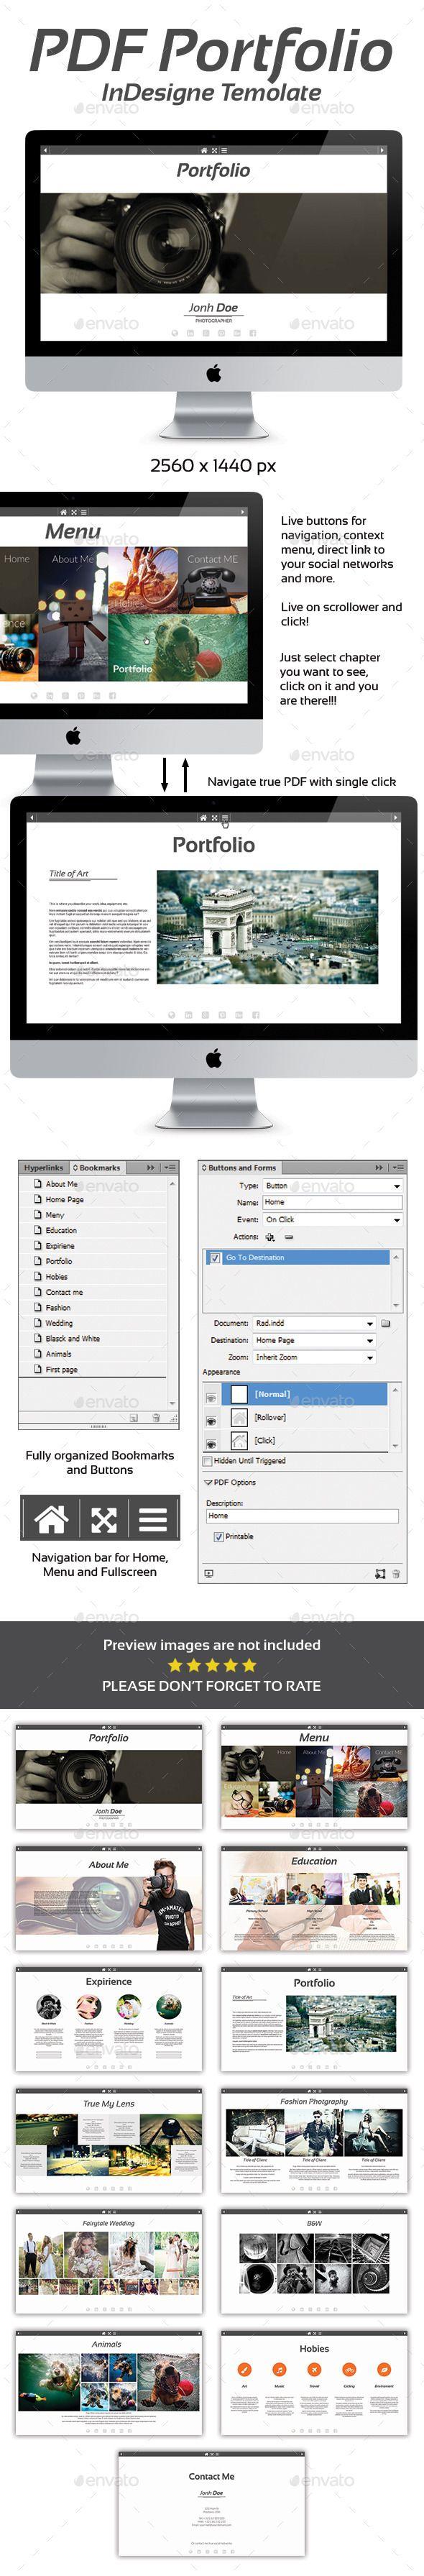 Interactive PDF Prezentation 2560x1440 Template #design Download: http://graphicriver.net/item/interactive-pdf-prezentation-2560x1440/12313328?ref=ksioks